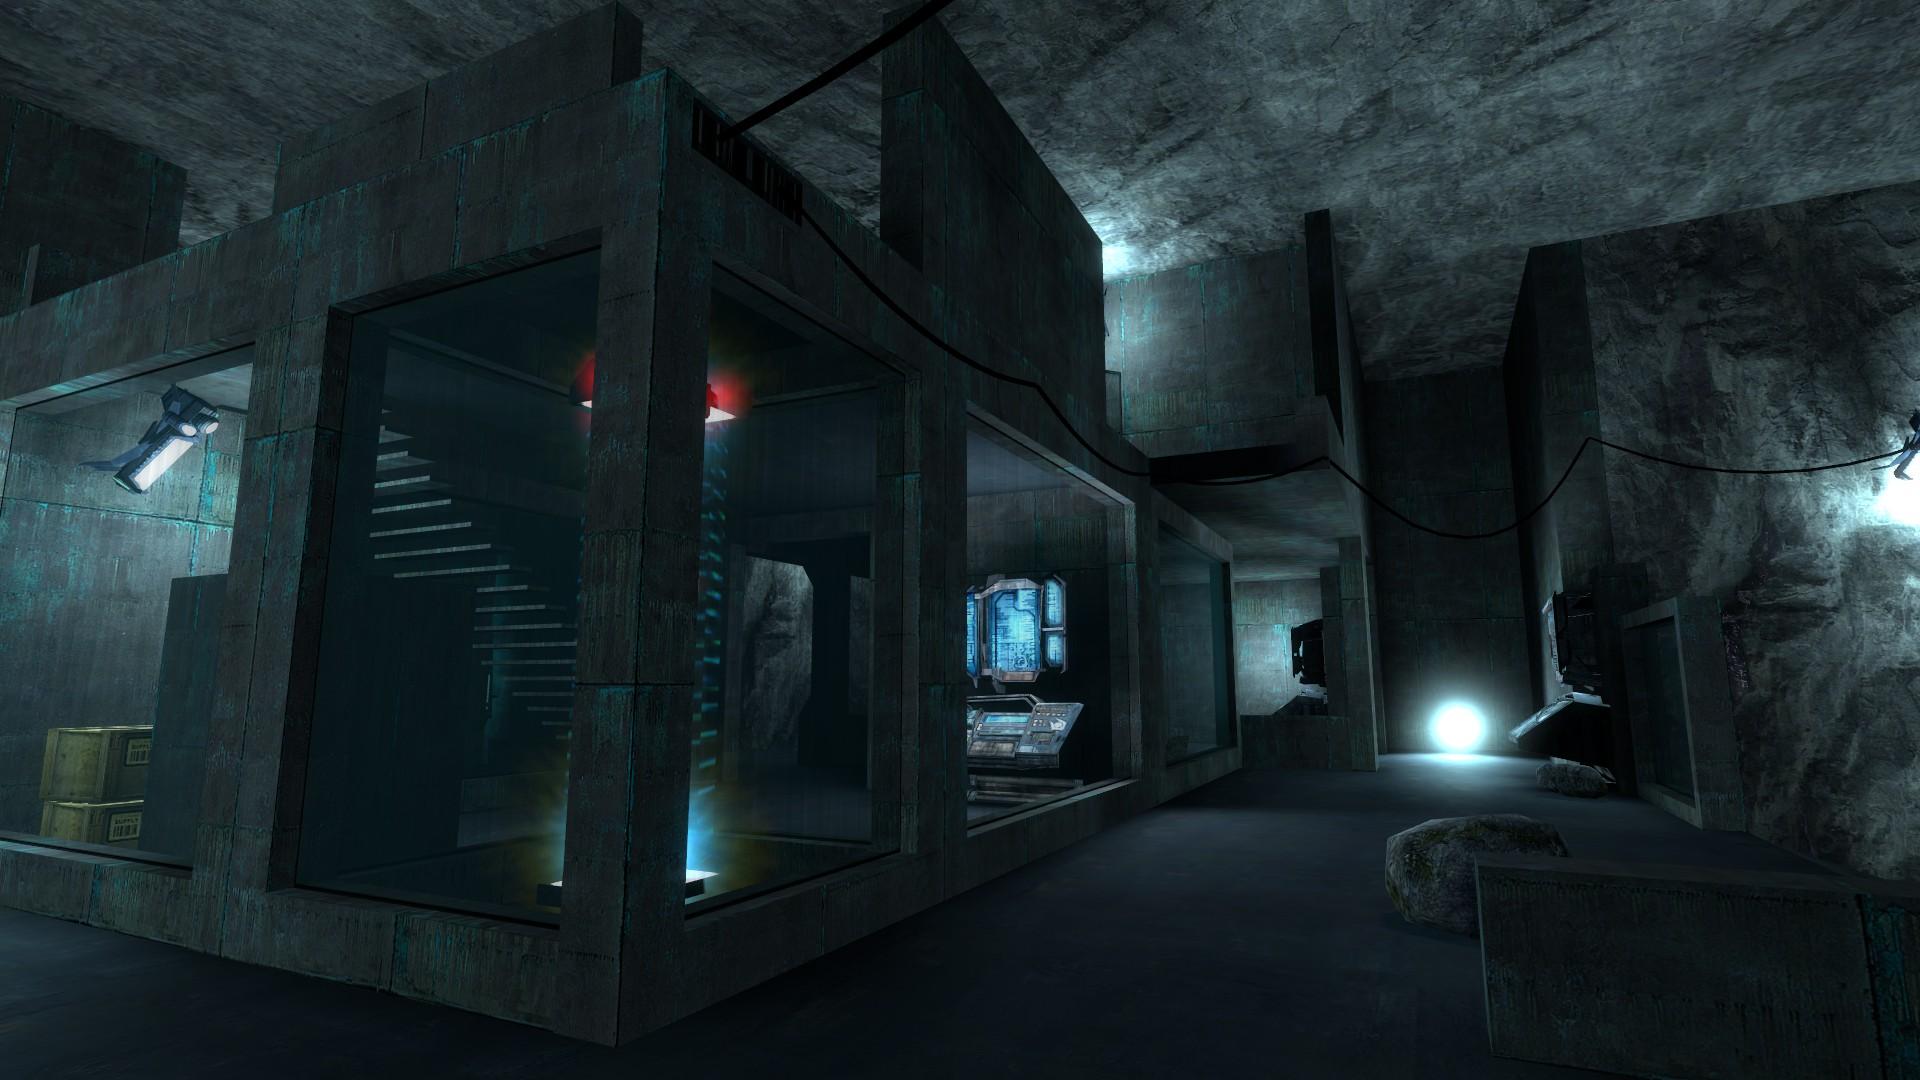 Post Gamejam Update Half Life 2 Episode 3 Proof Of Concept By Gazz Thebeach